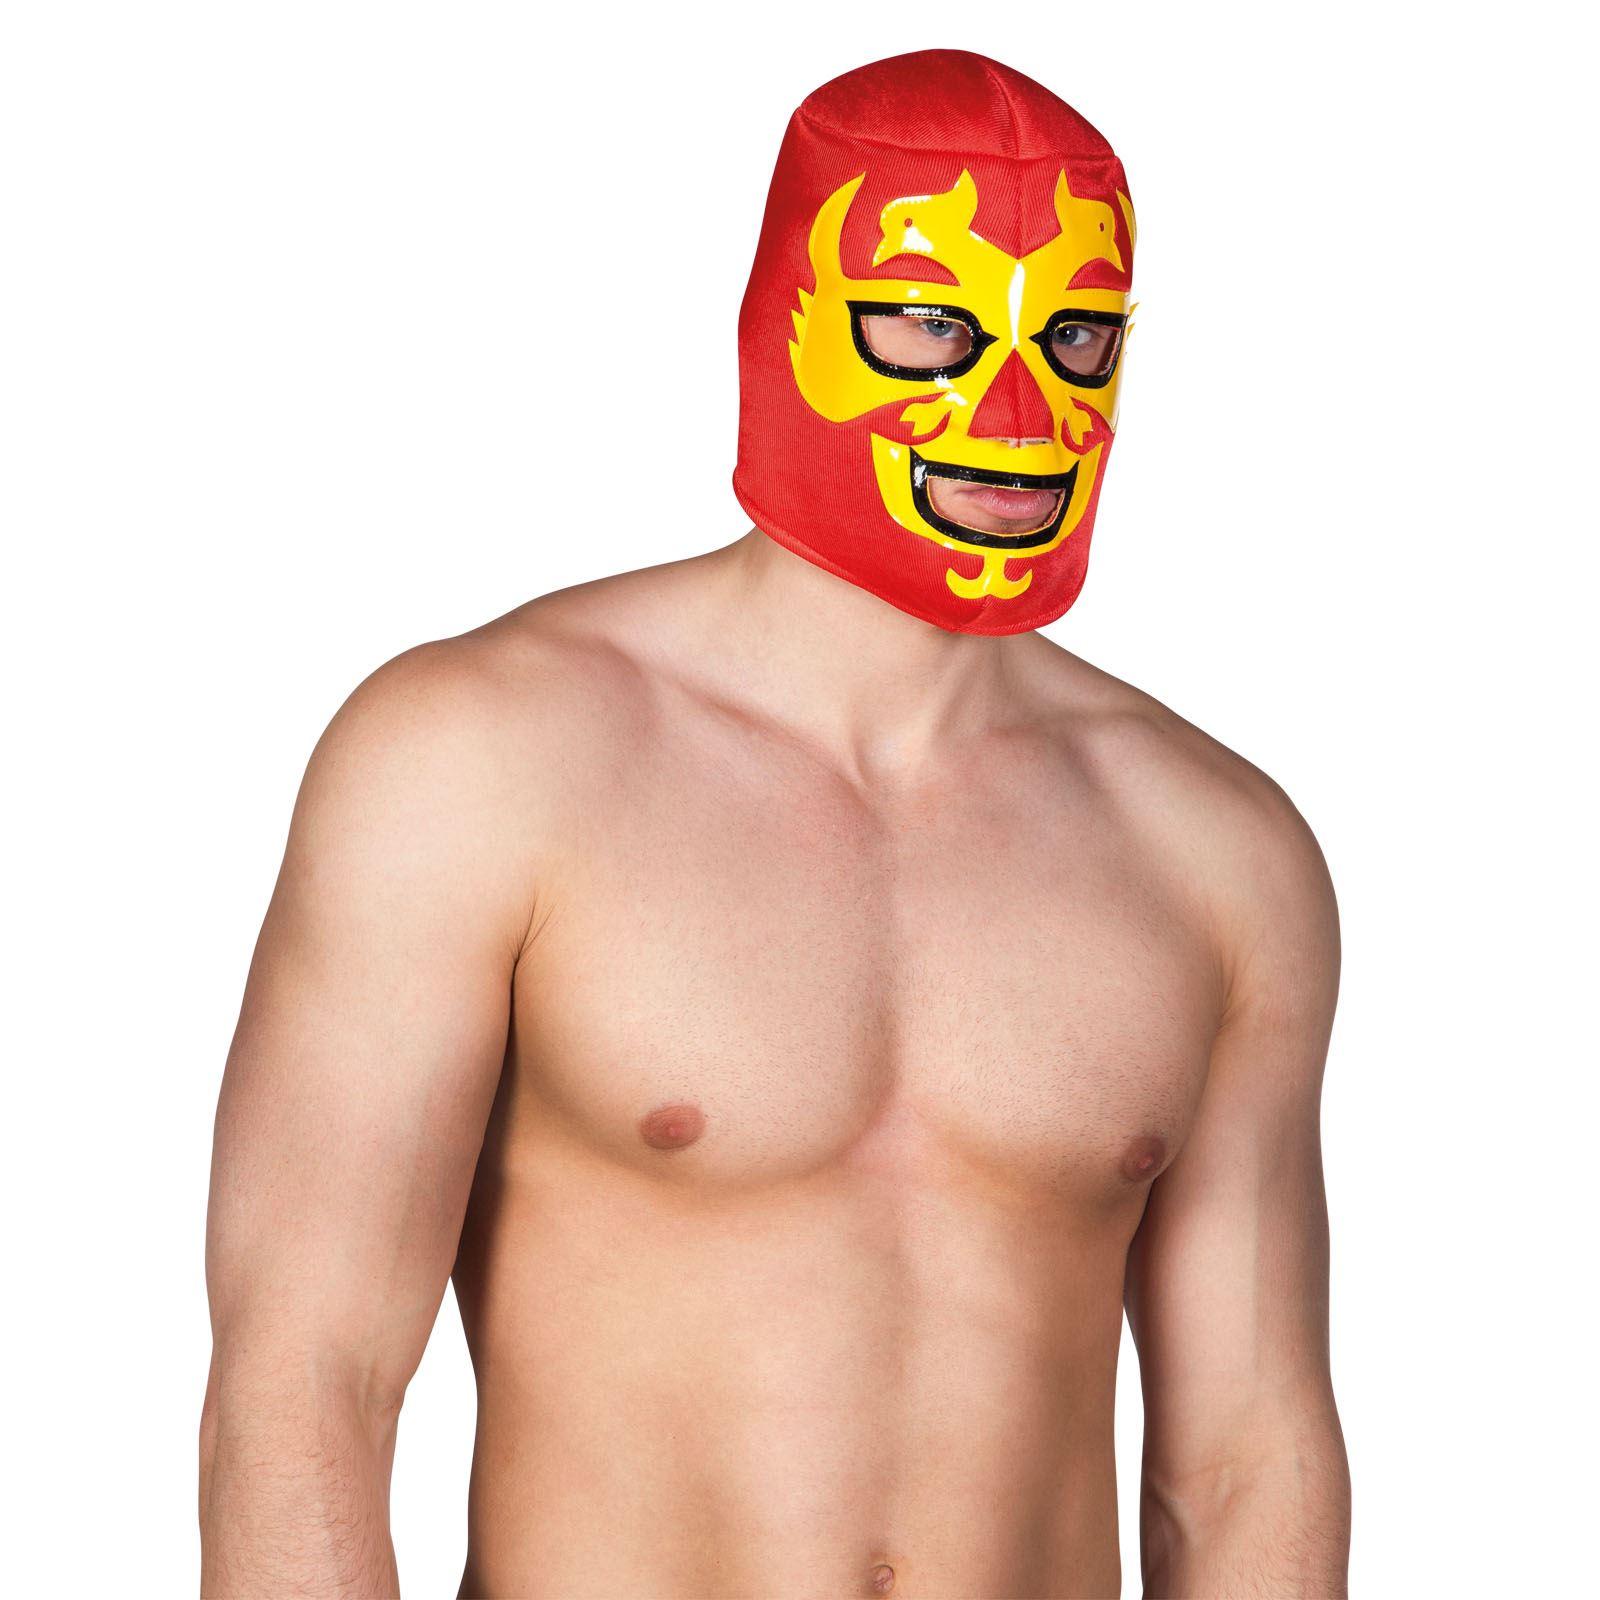 Adult-Mens-Mexican-Wrestler-Wrestling-Mask-WWE-Libre-Fight-Fancy-Dress-Accessory miniatuur 6